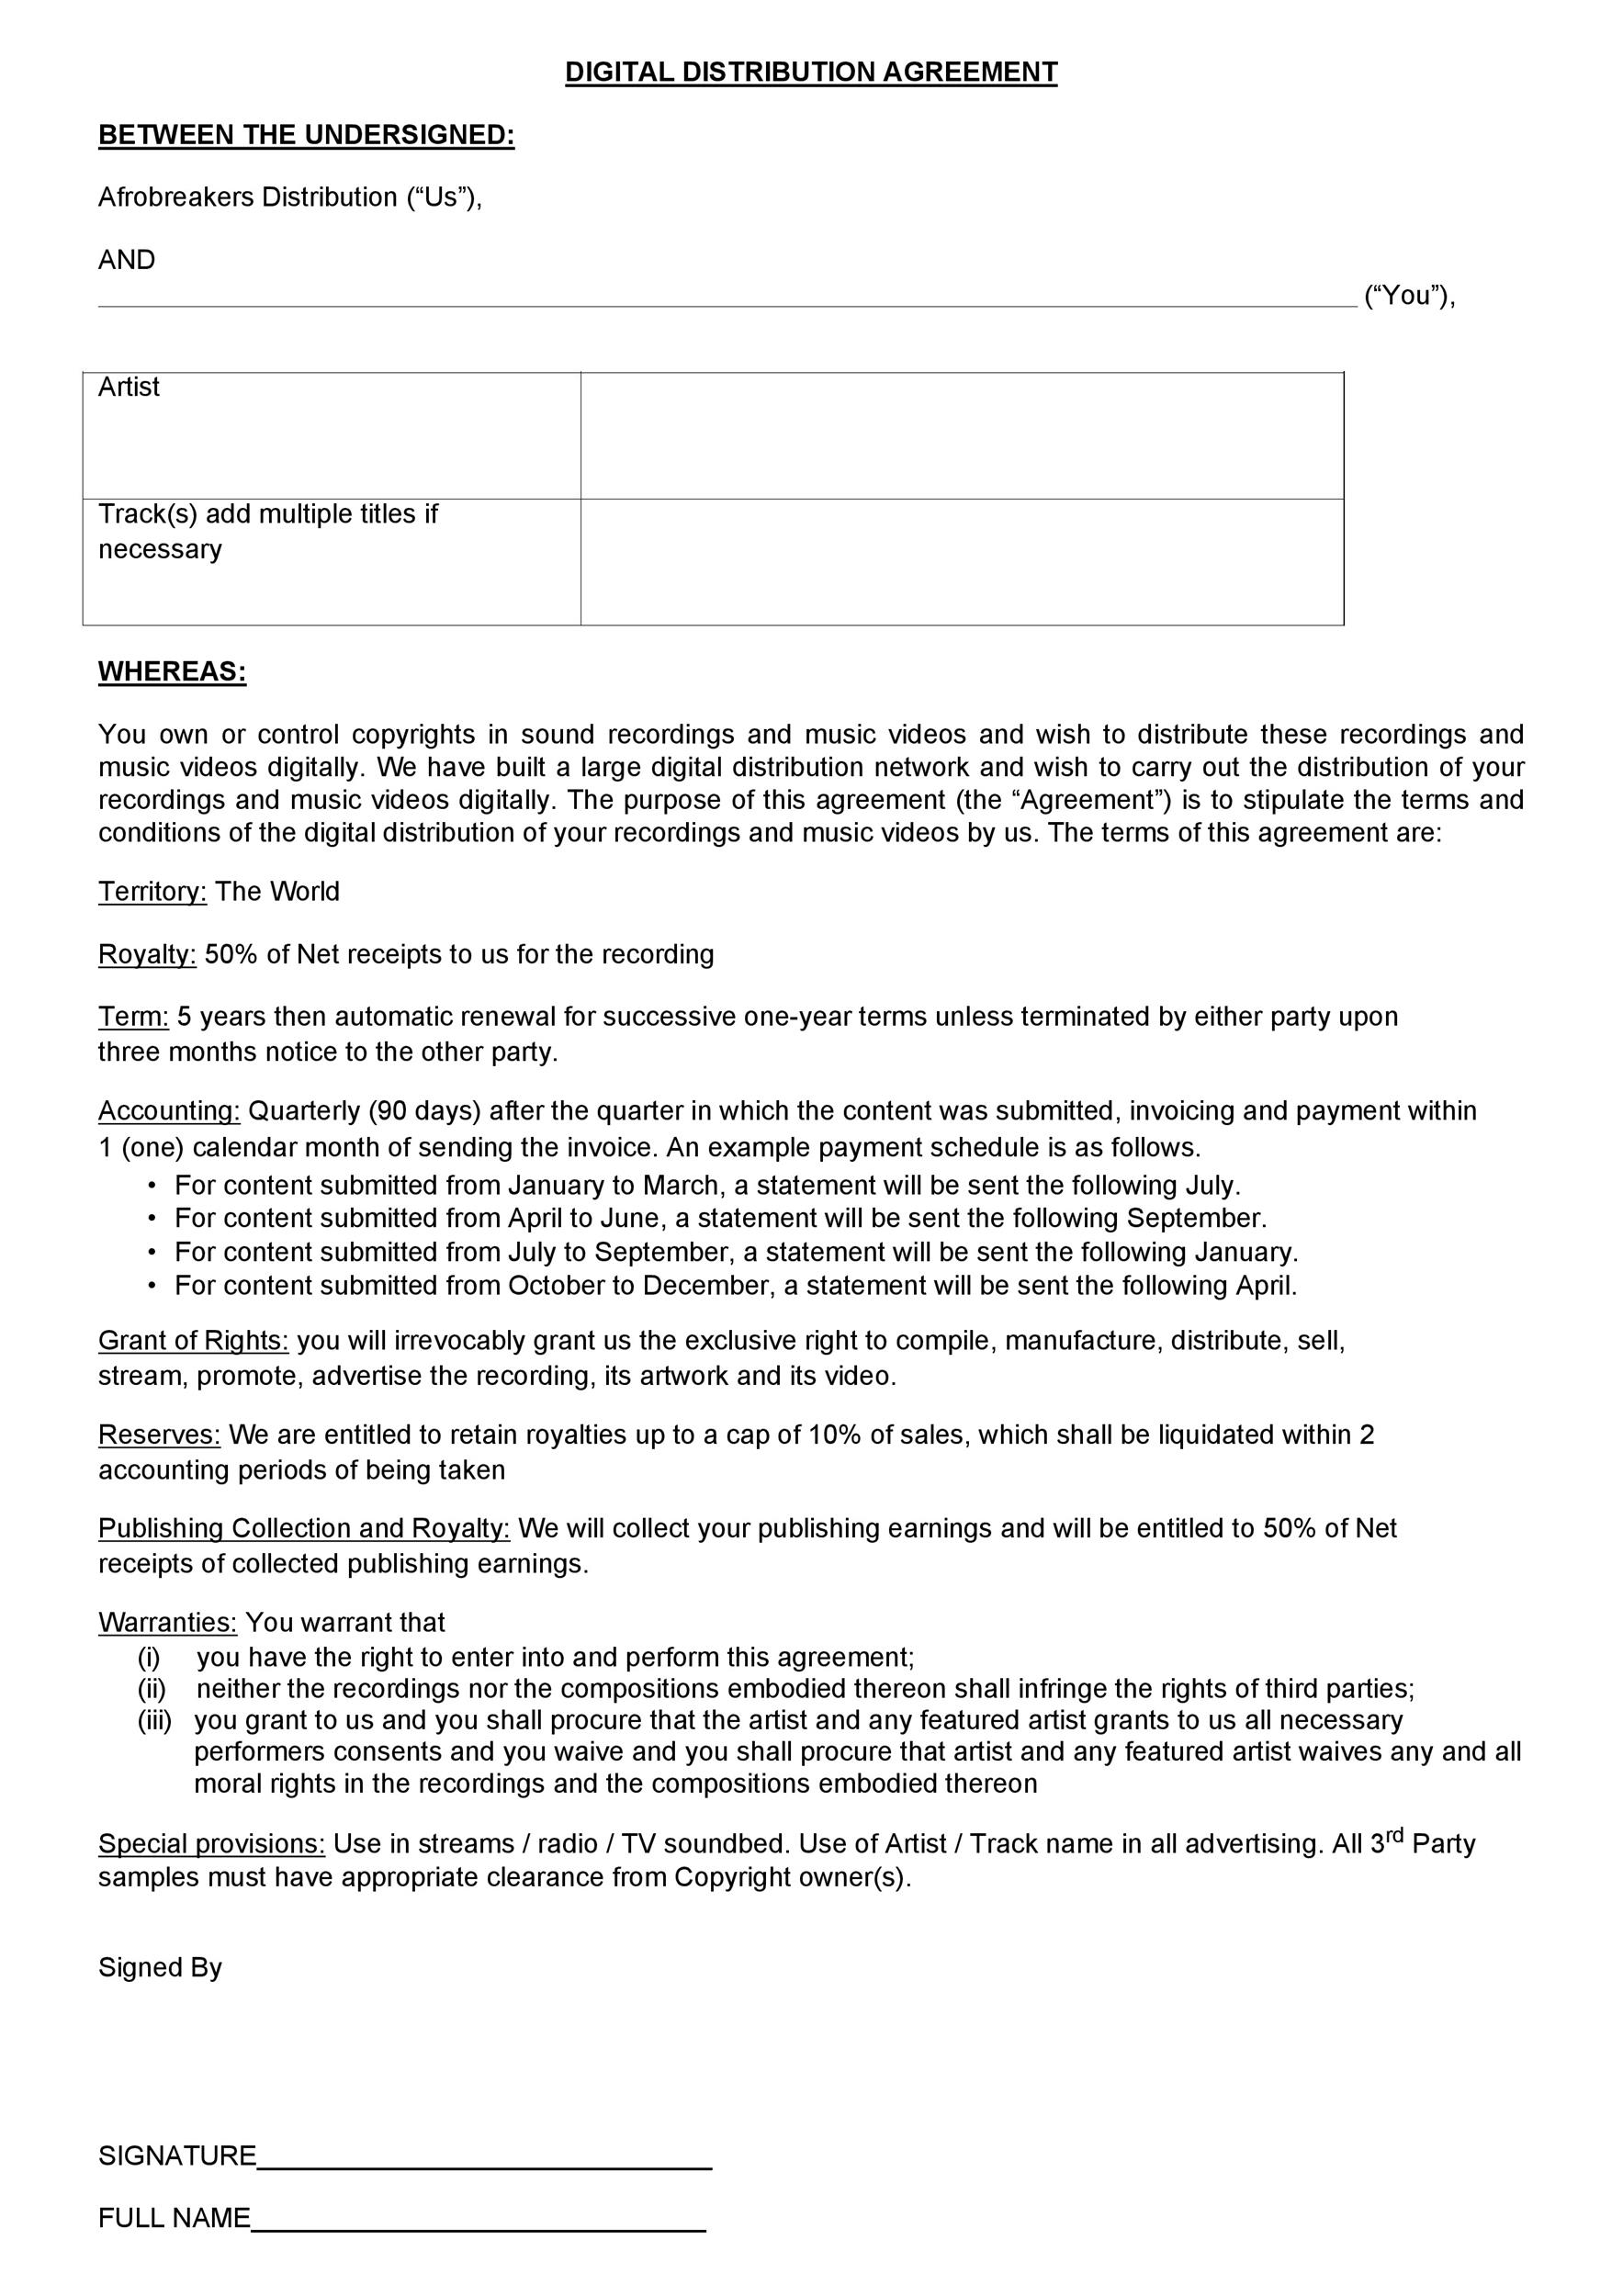 Free distribution agreement 22